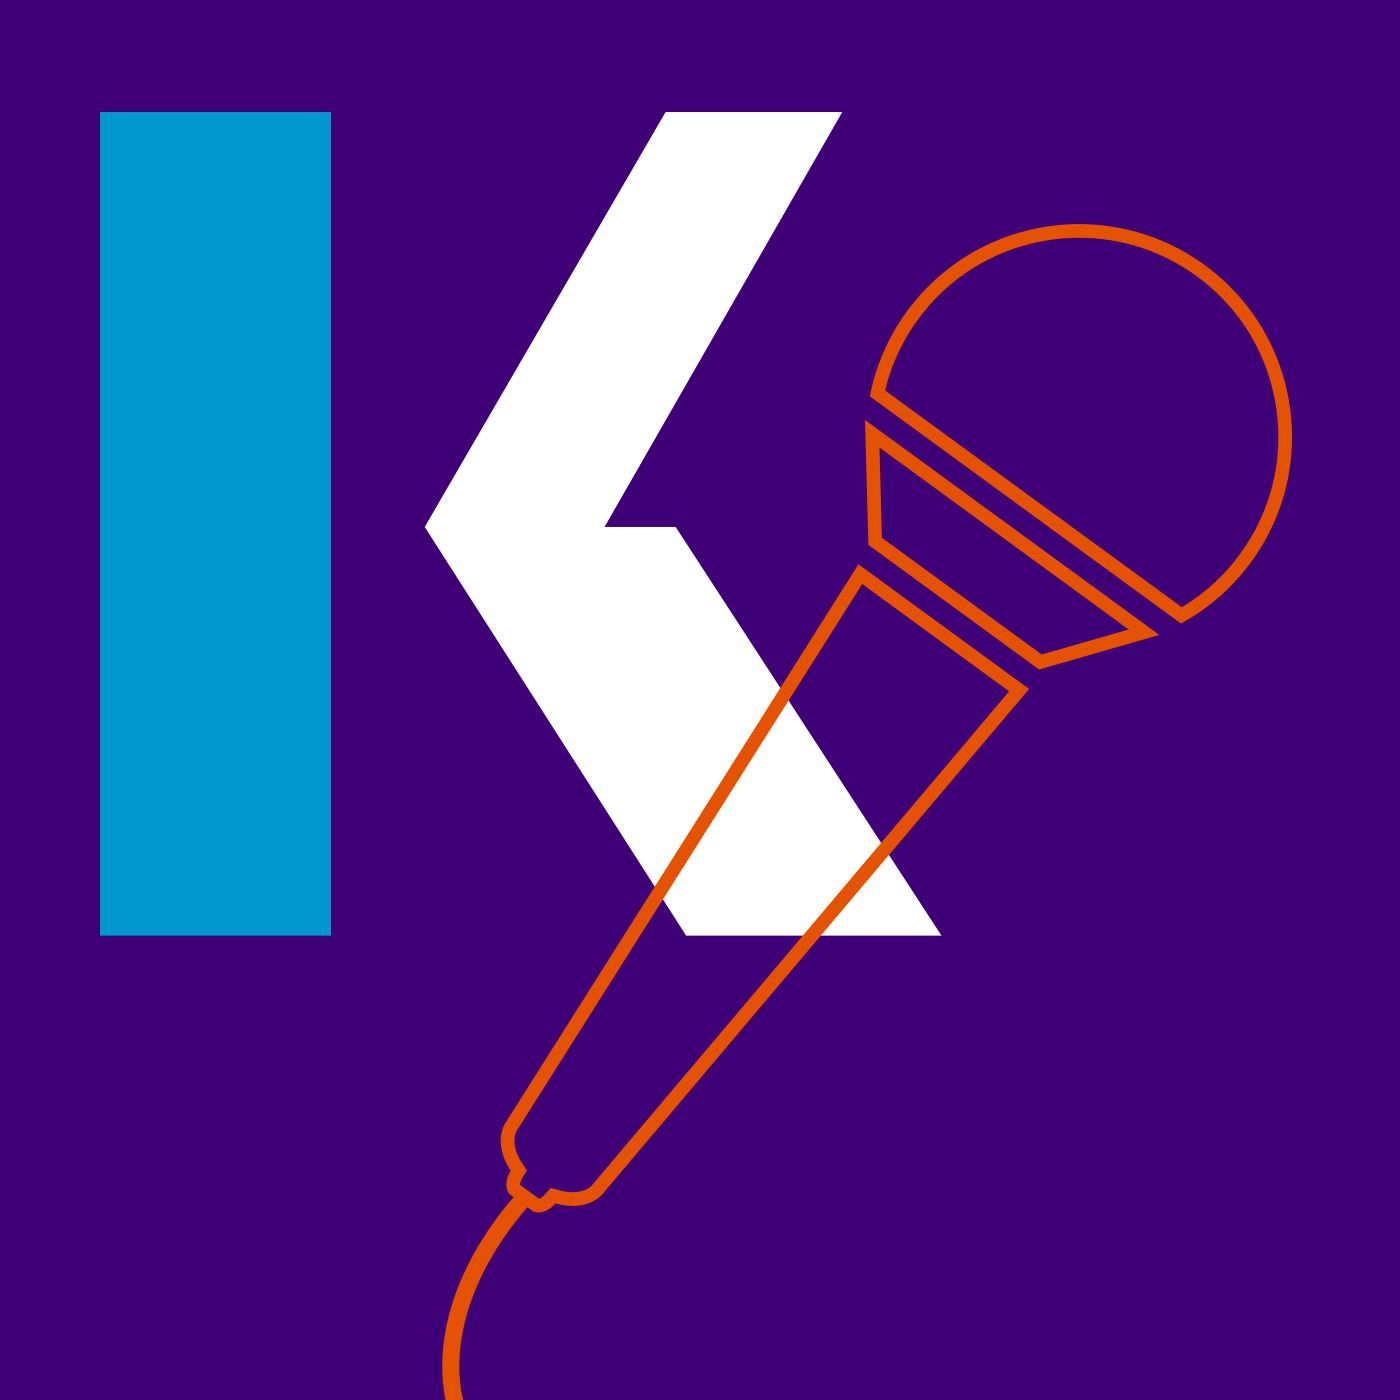 Kaplan's NCLEX Prepcast - Episode 37 - Critical Care Nursing